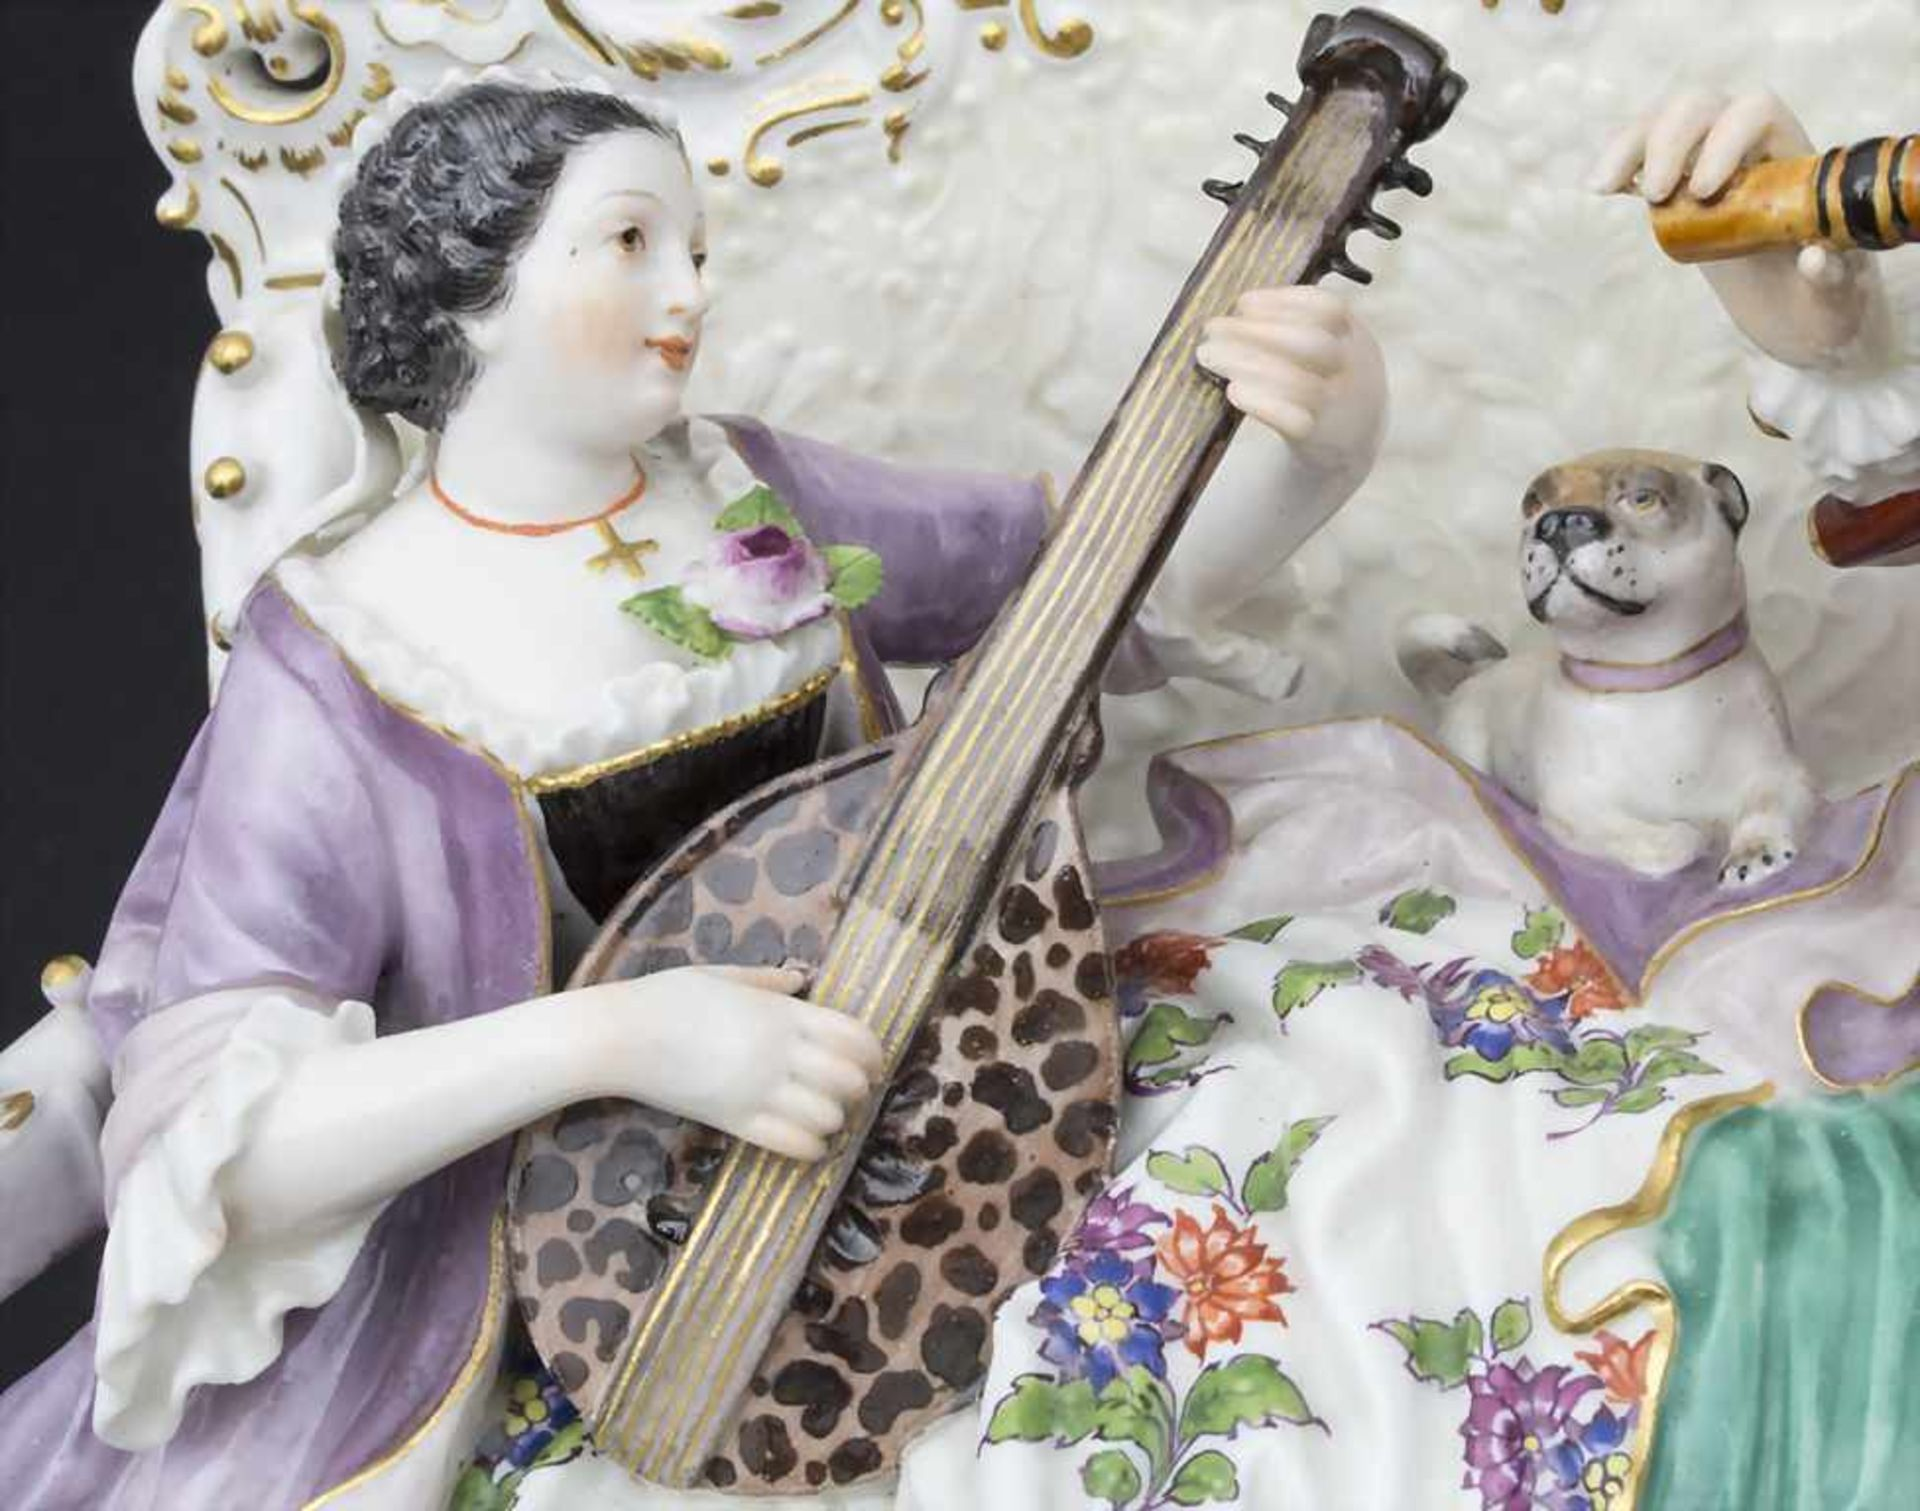 'Sofagruppe', musizierendes Paar mit Mops / A couple of musicians with a pug dog, Meissen, Mitte 19. - Bild 6 aus 9